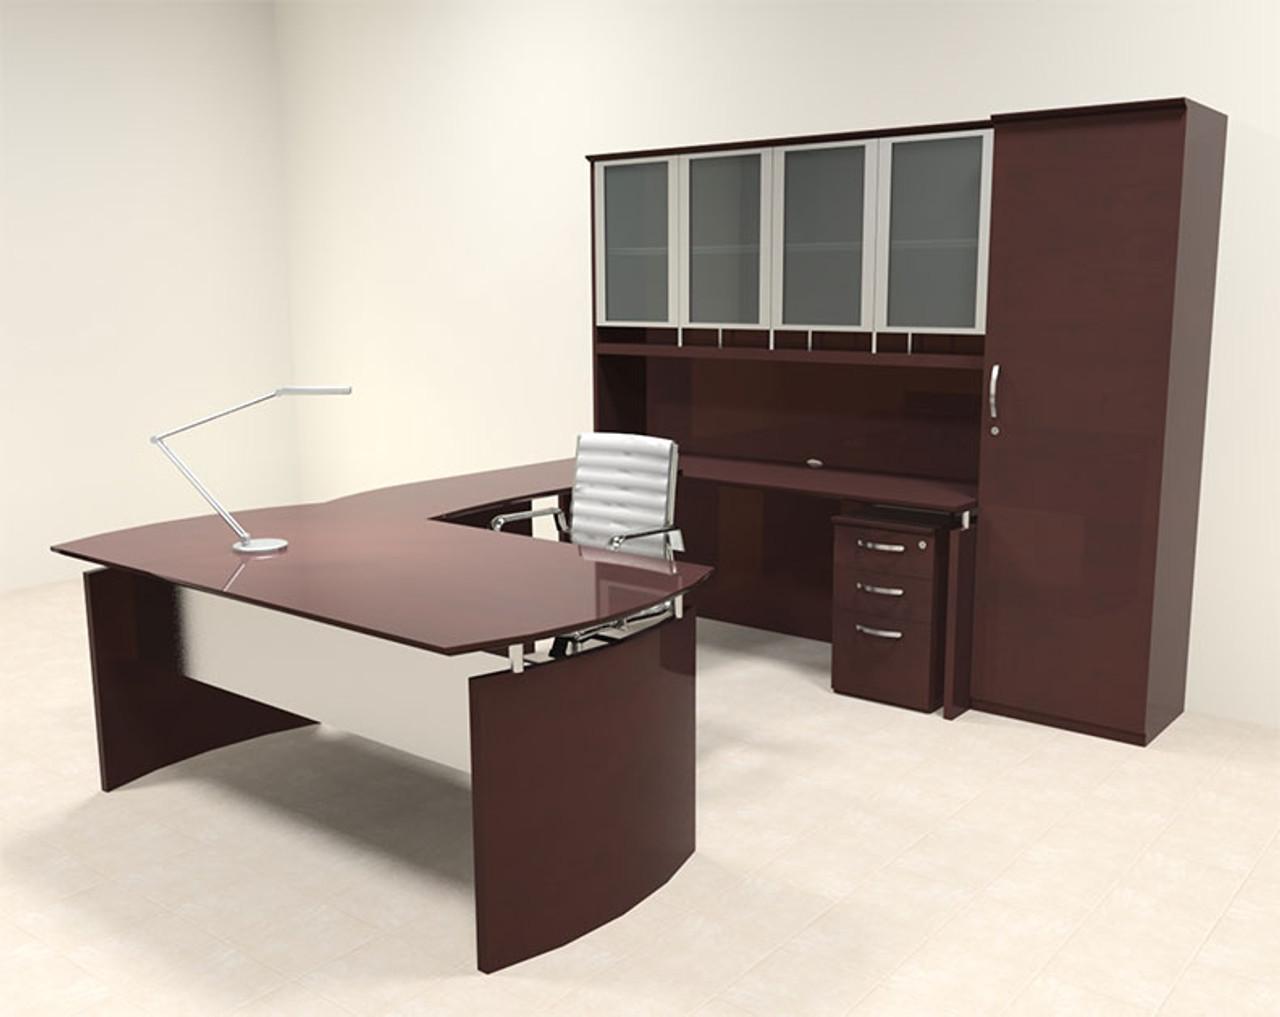 6pc Modern Contemporary U Shape Executive Office Desk Set, #RO-NAP-U12